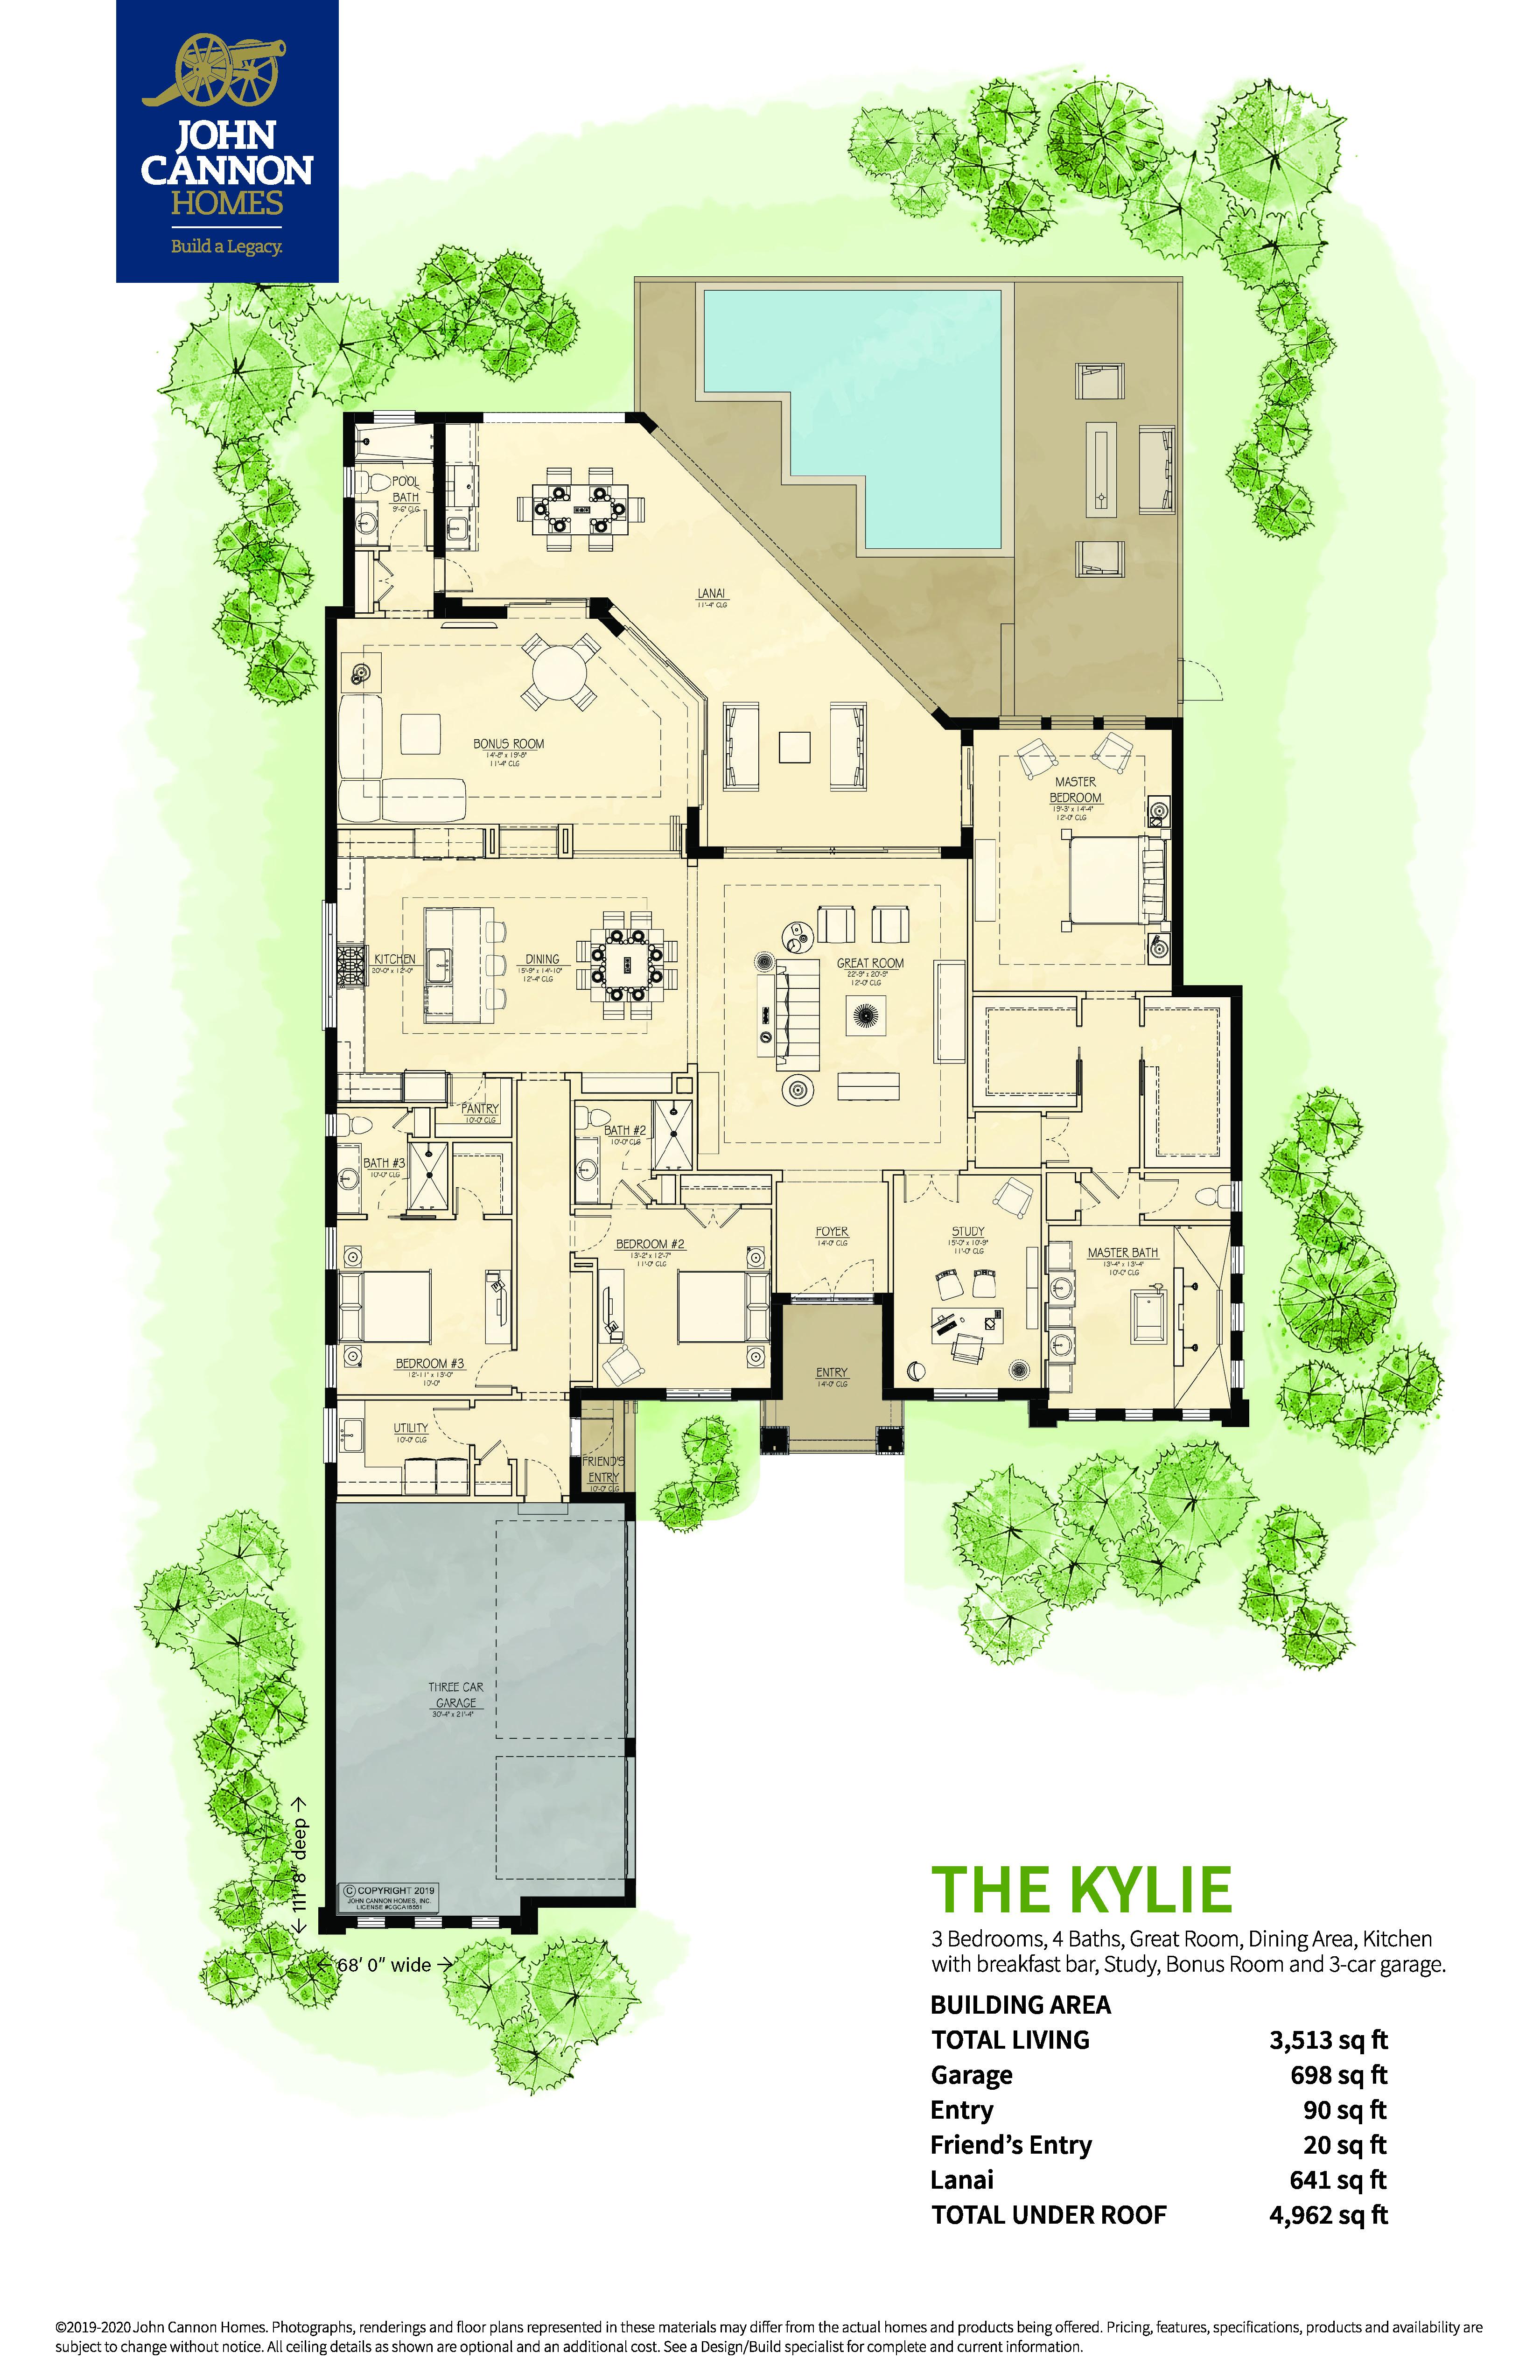 Kylie Floorplan